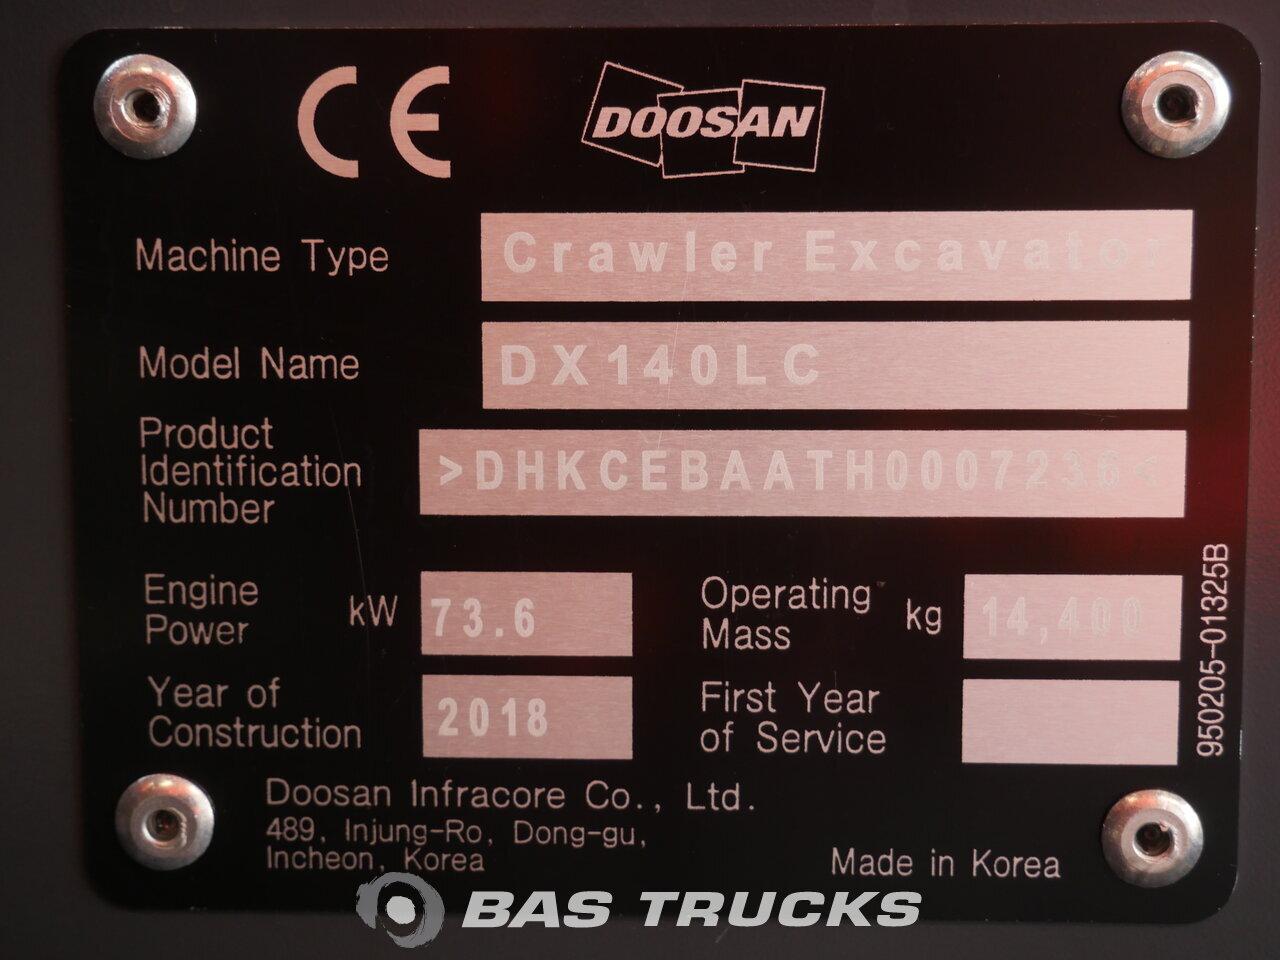 For sale at BAS Trucks: Doosan DX 140 LC Track 01/2018